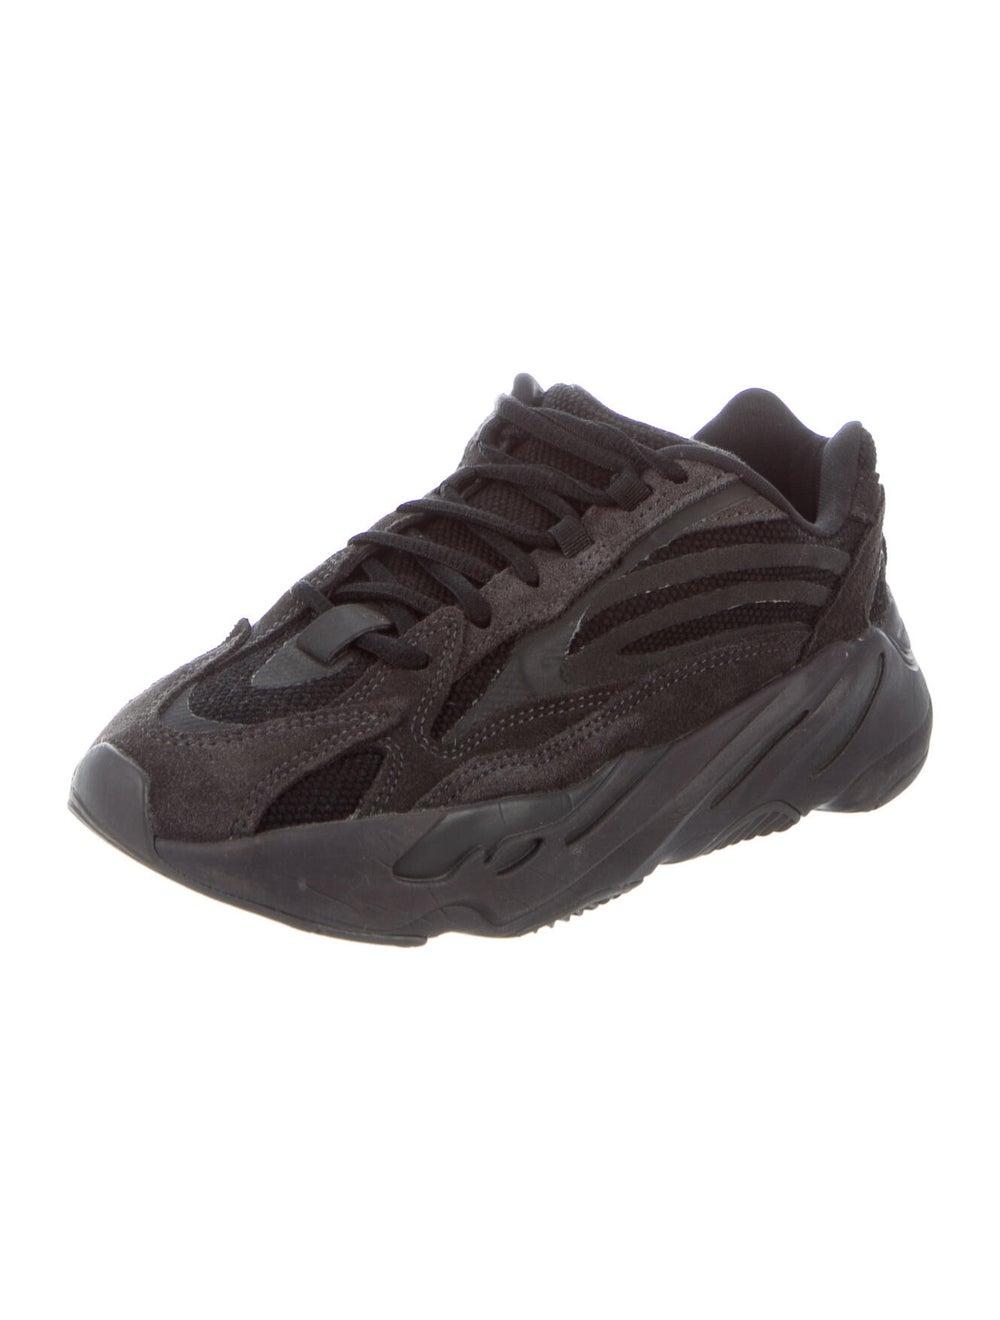 Yeezy x adidas 2019 Boost 700 V2 Vanta Sneakers S… - image 2